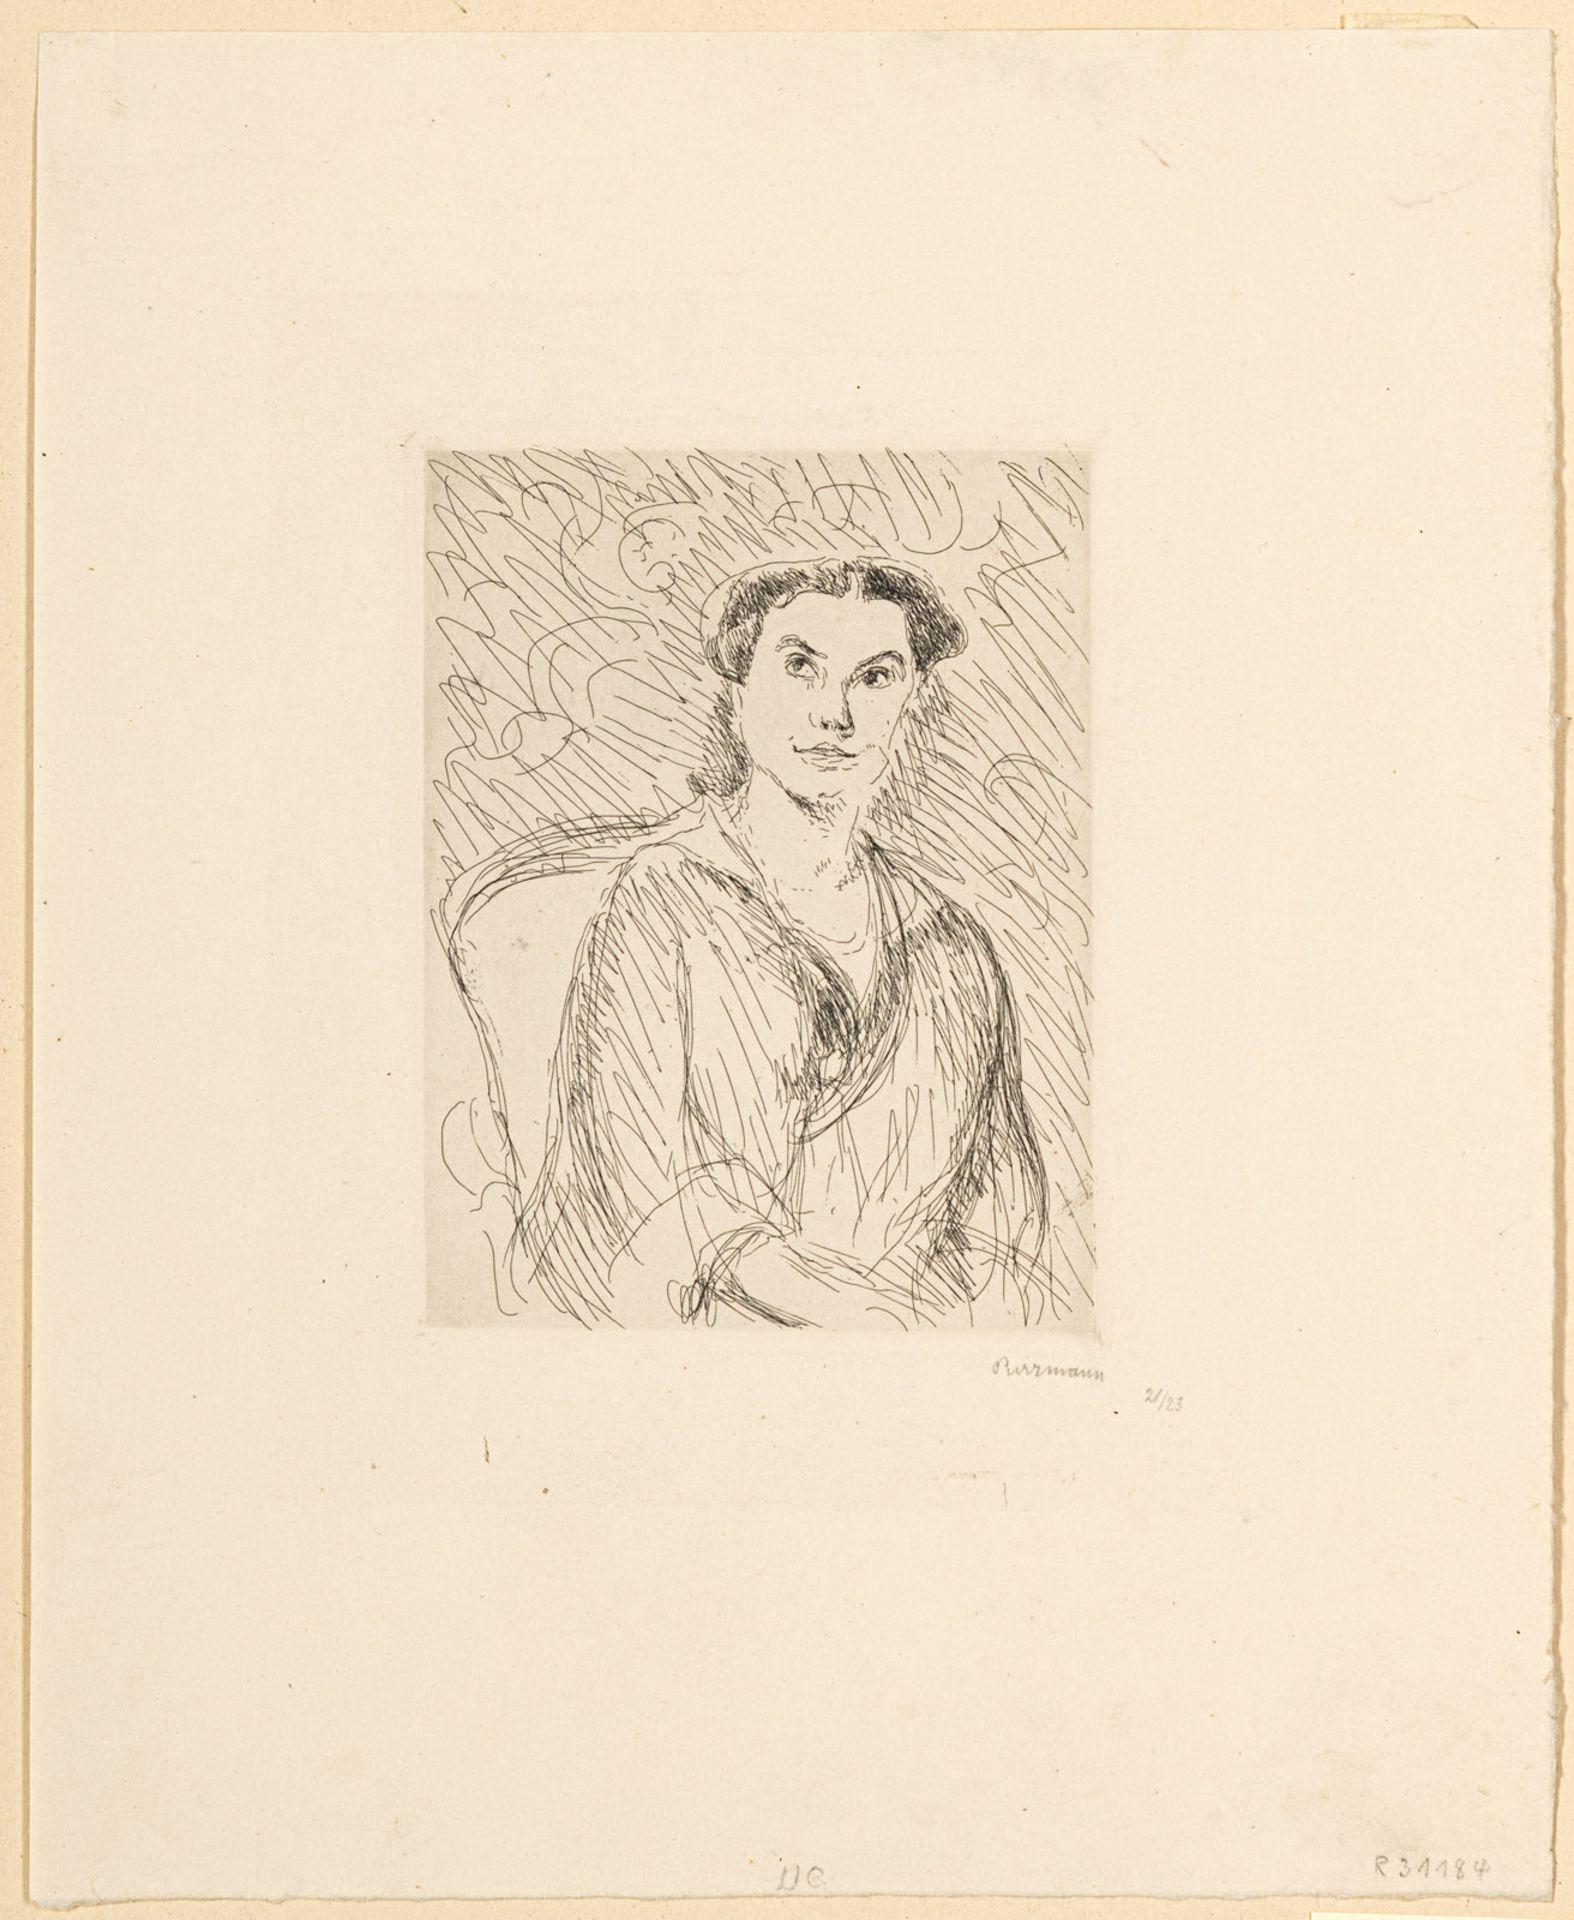 Purrmann, Hans - Image 5 of 6